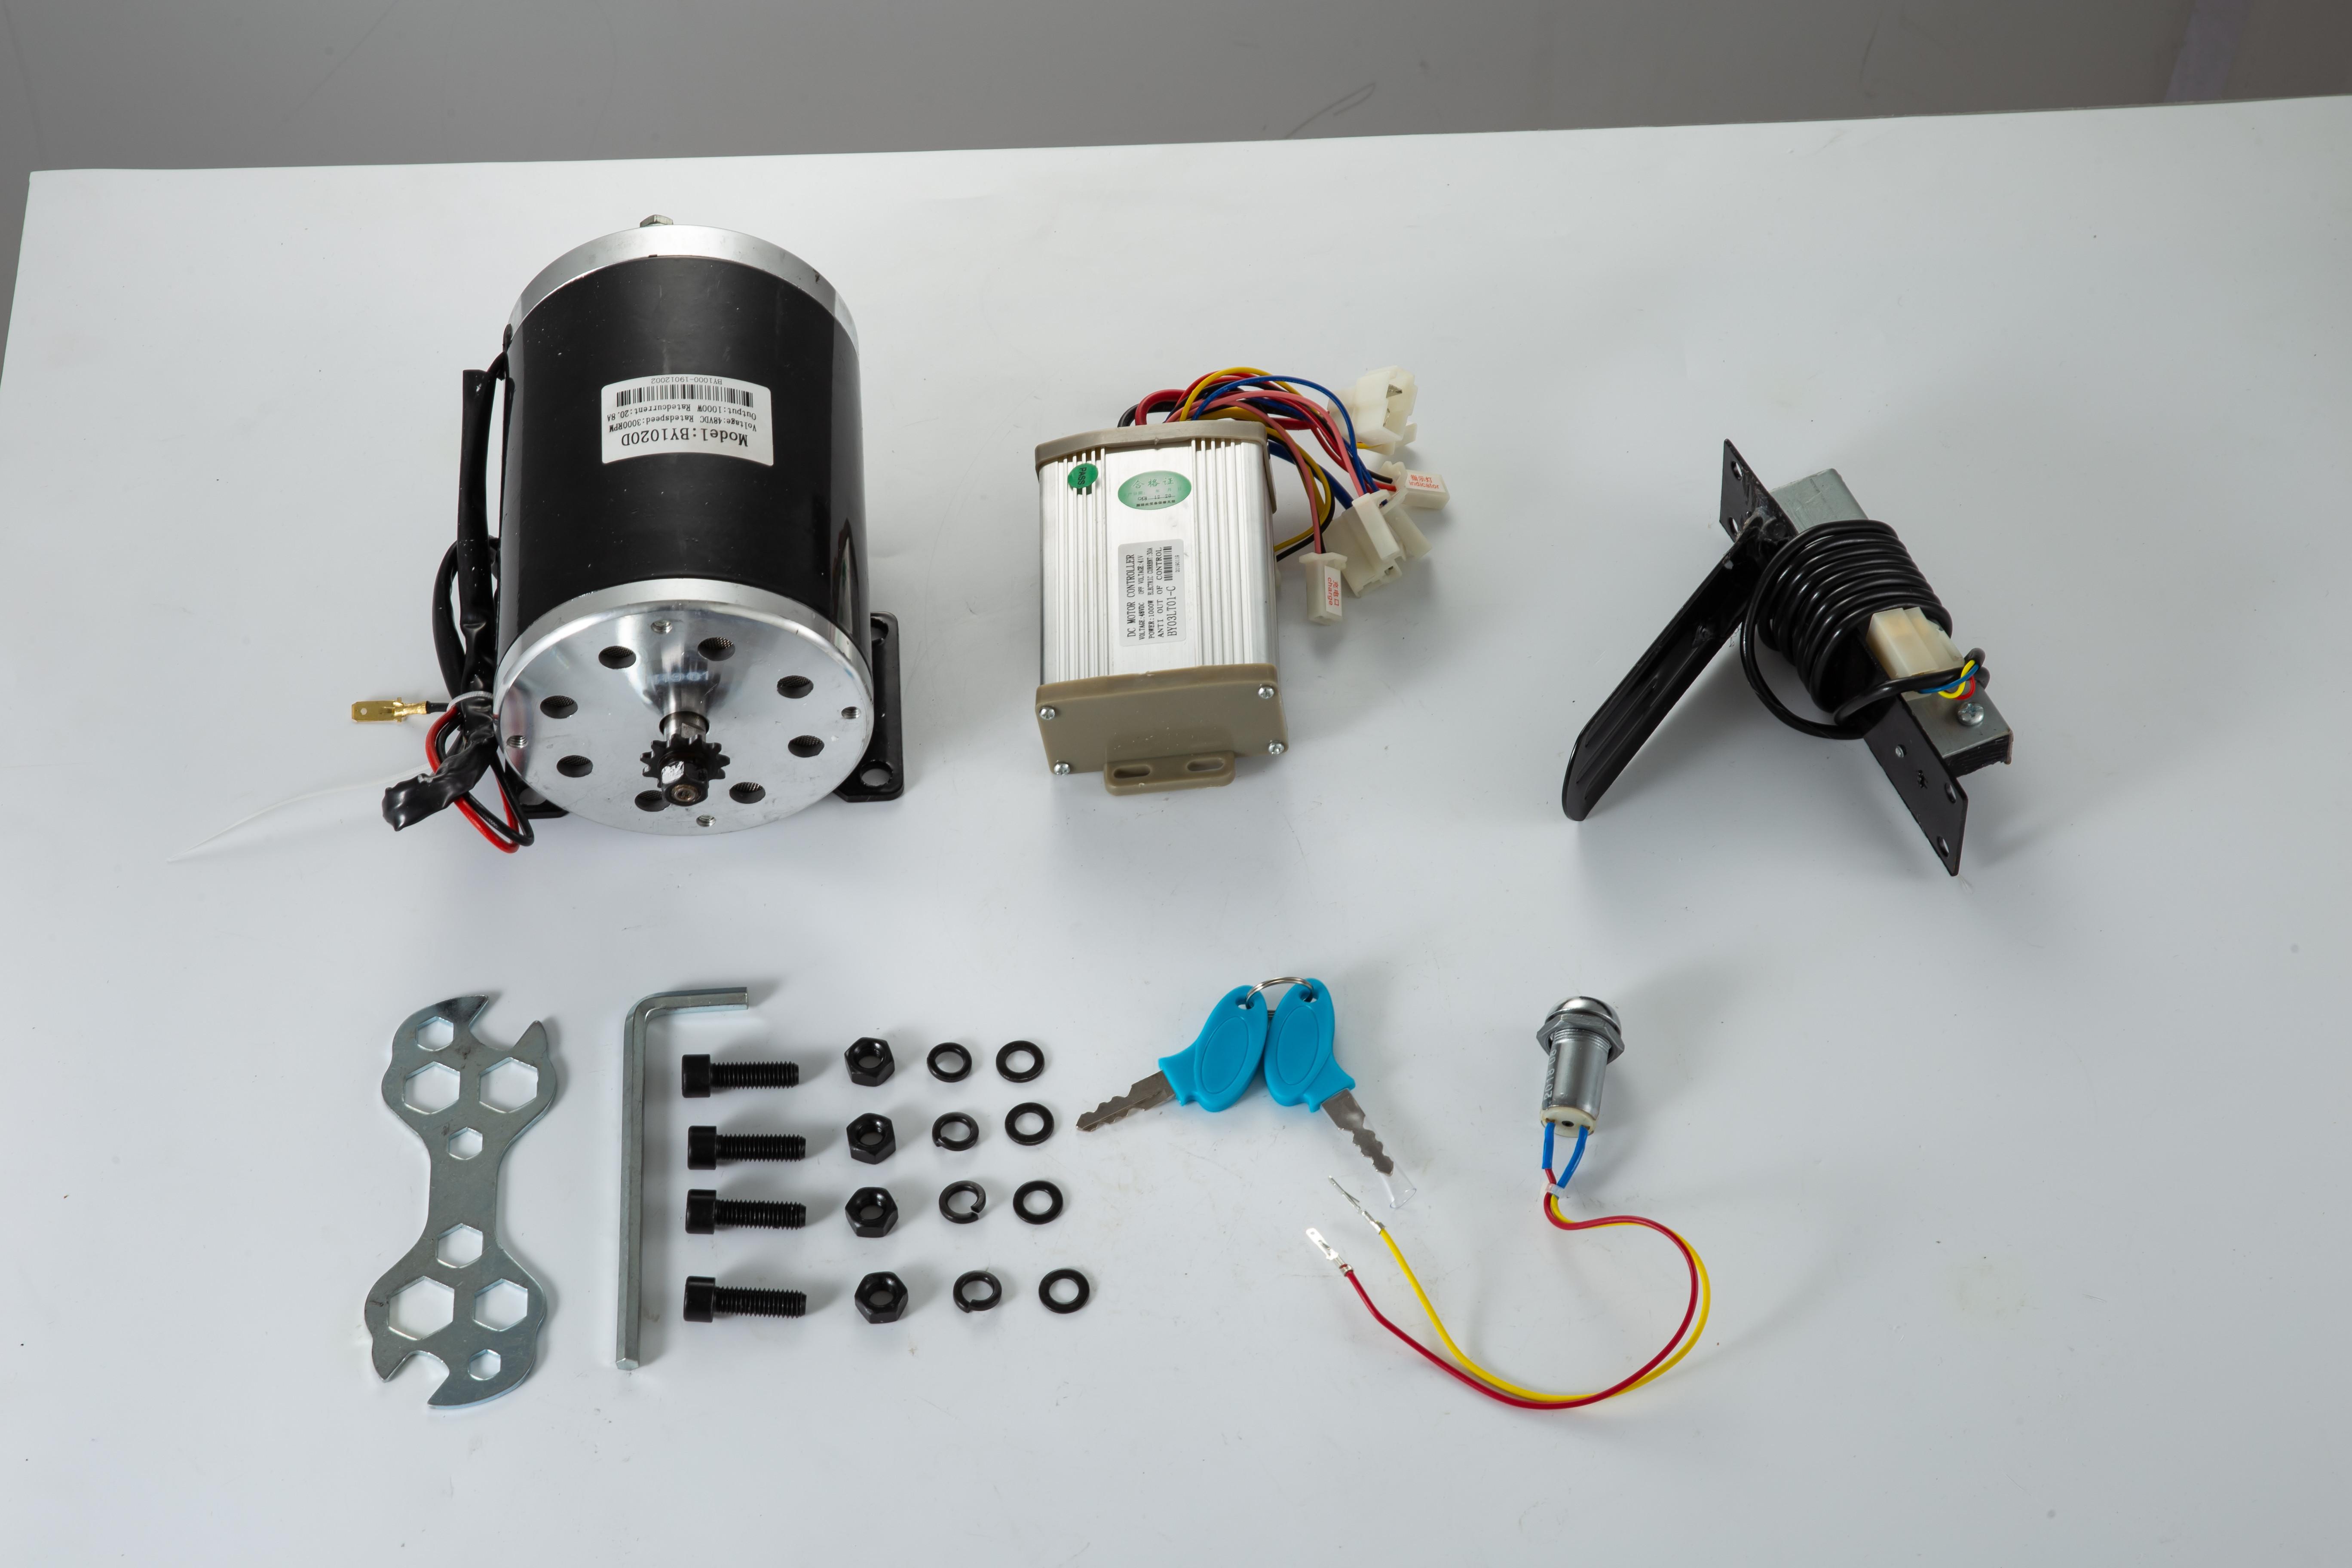 1800W-48V-DC-Brushless-Electric-Motor-Kit-f-Scooter-500-1800W-E-Bike-Go-Kart thumbnail 108